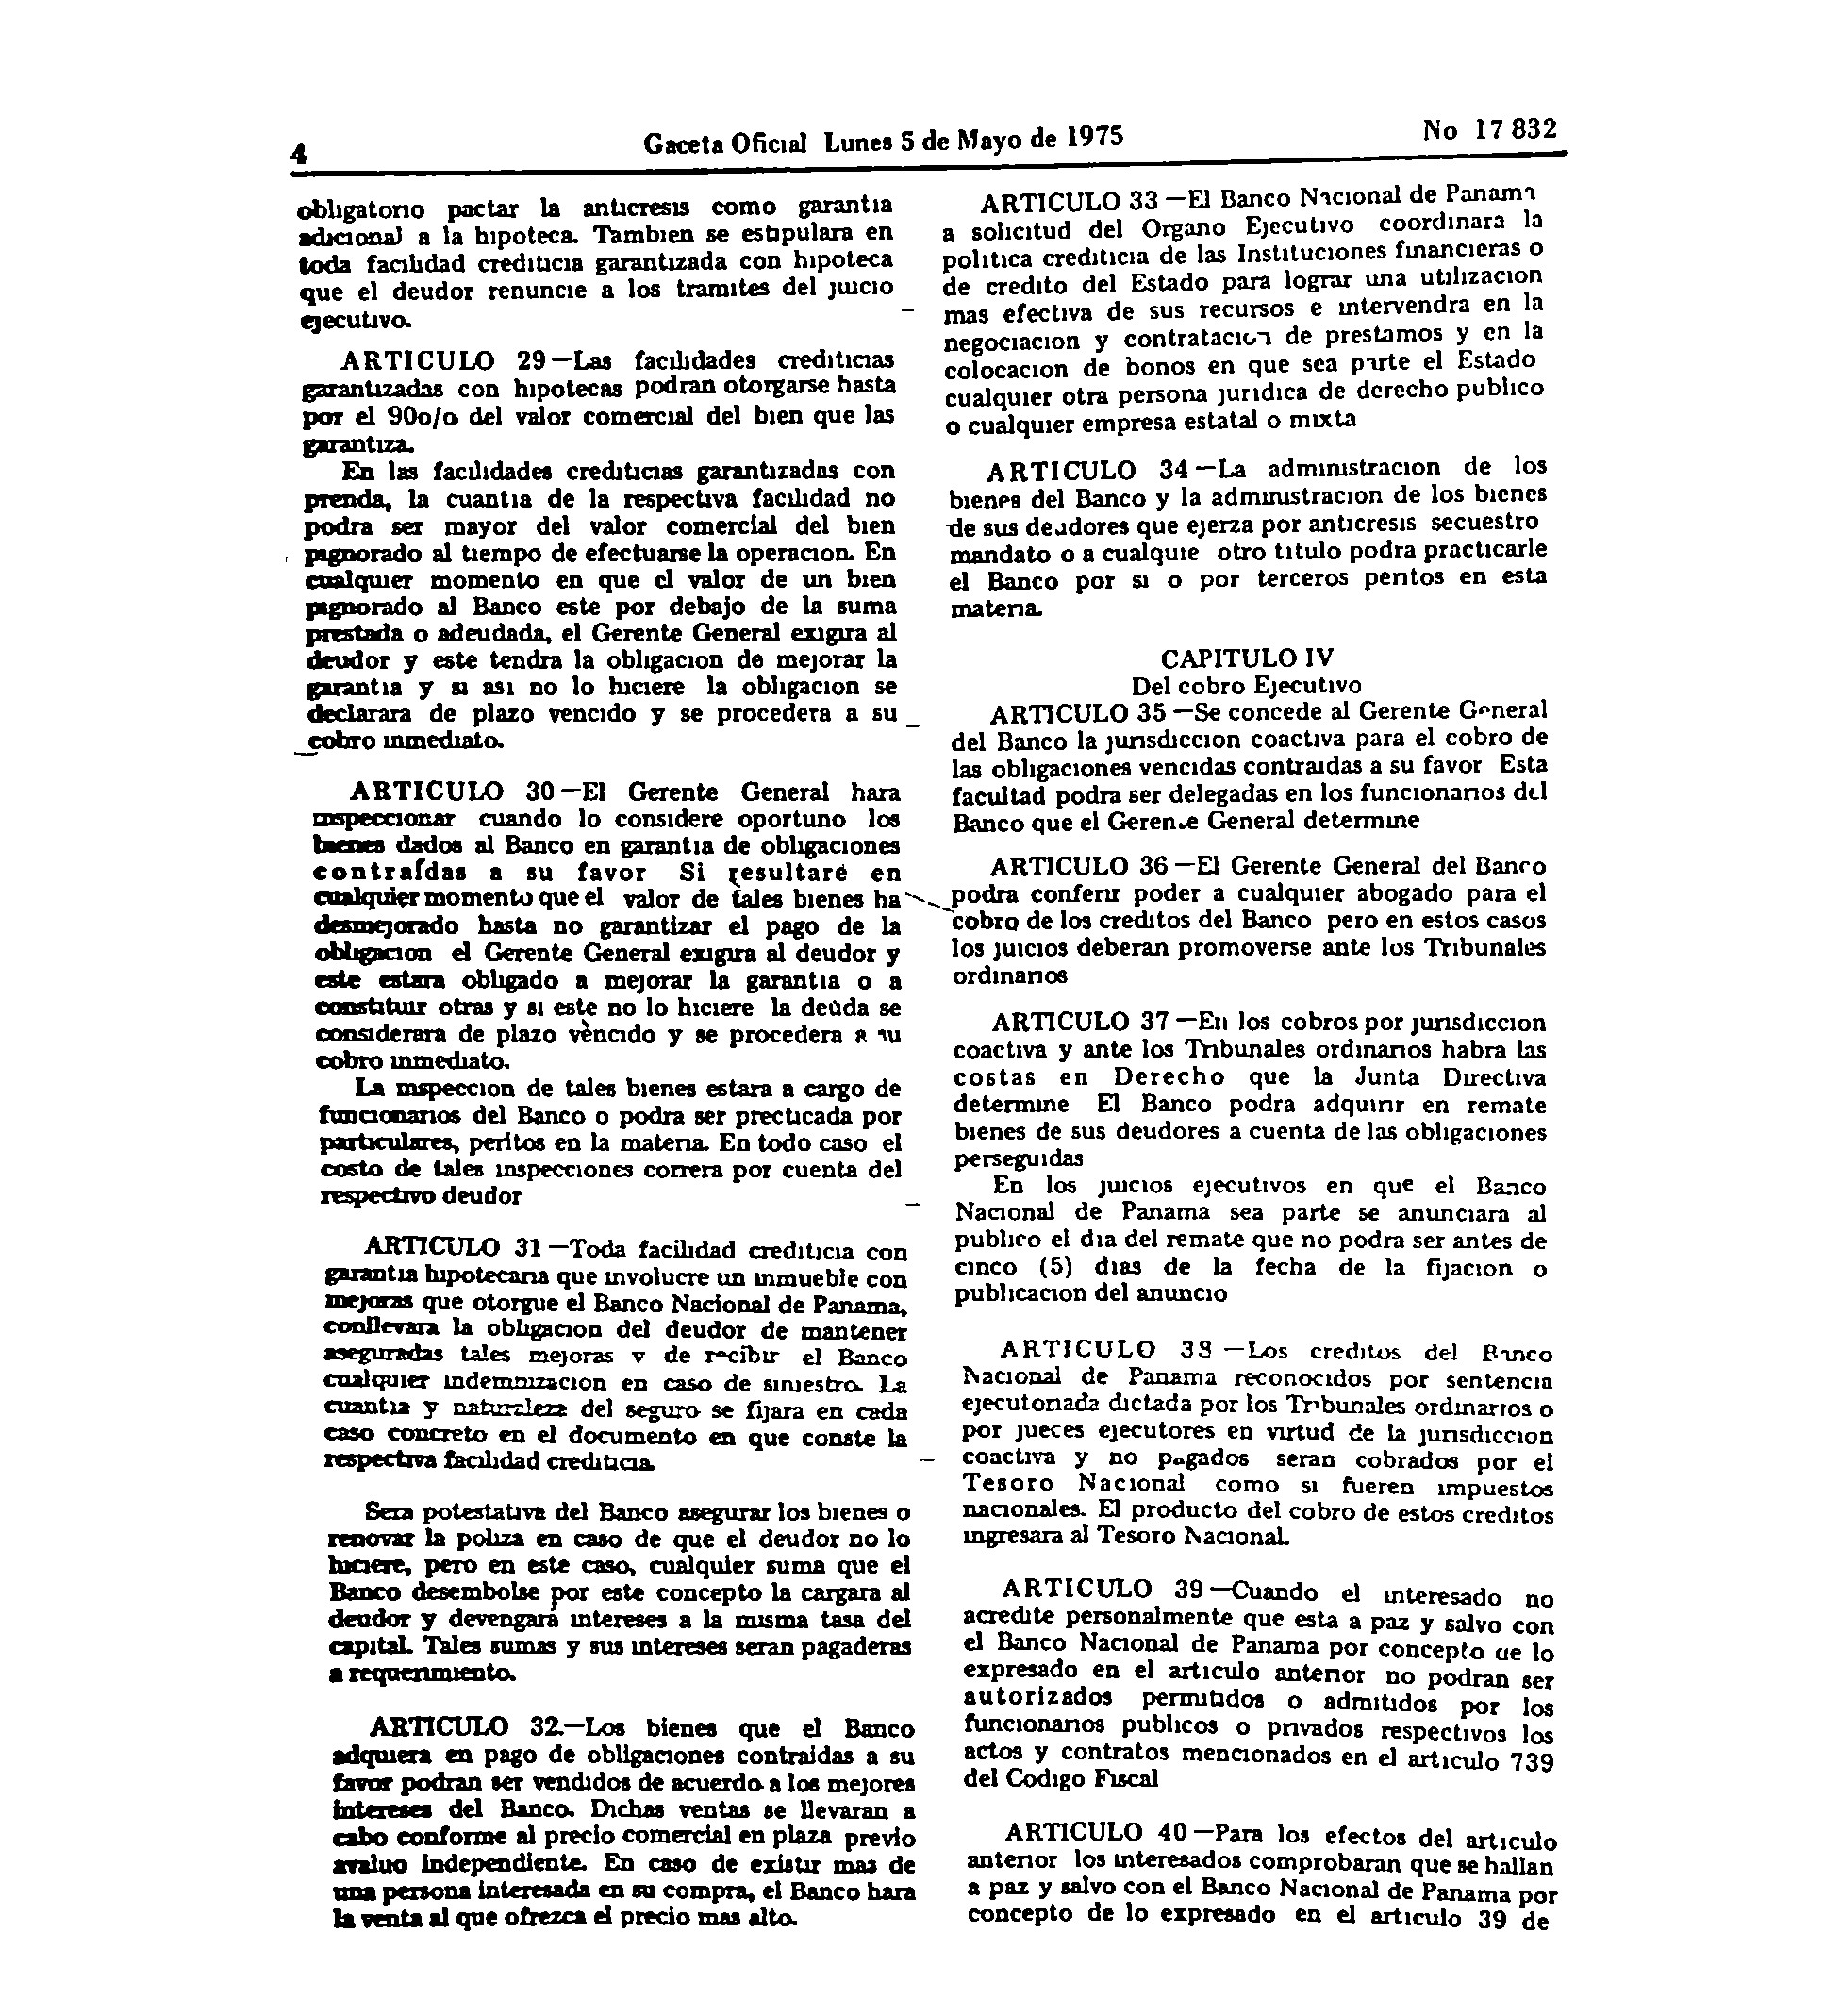 4 Caceta icial Lunes 5 de Mayo de 1975 obligatorio pactar la anticresis o garantia adicional